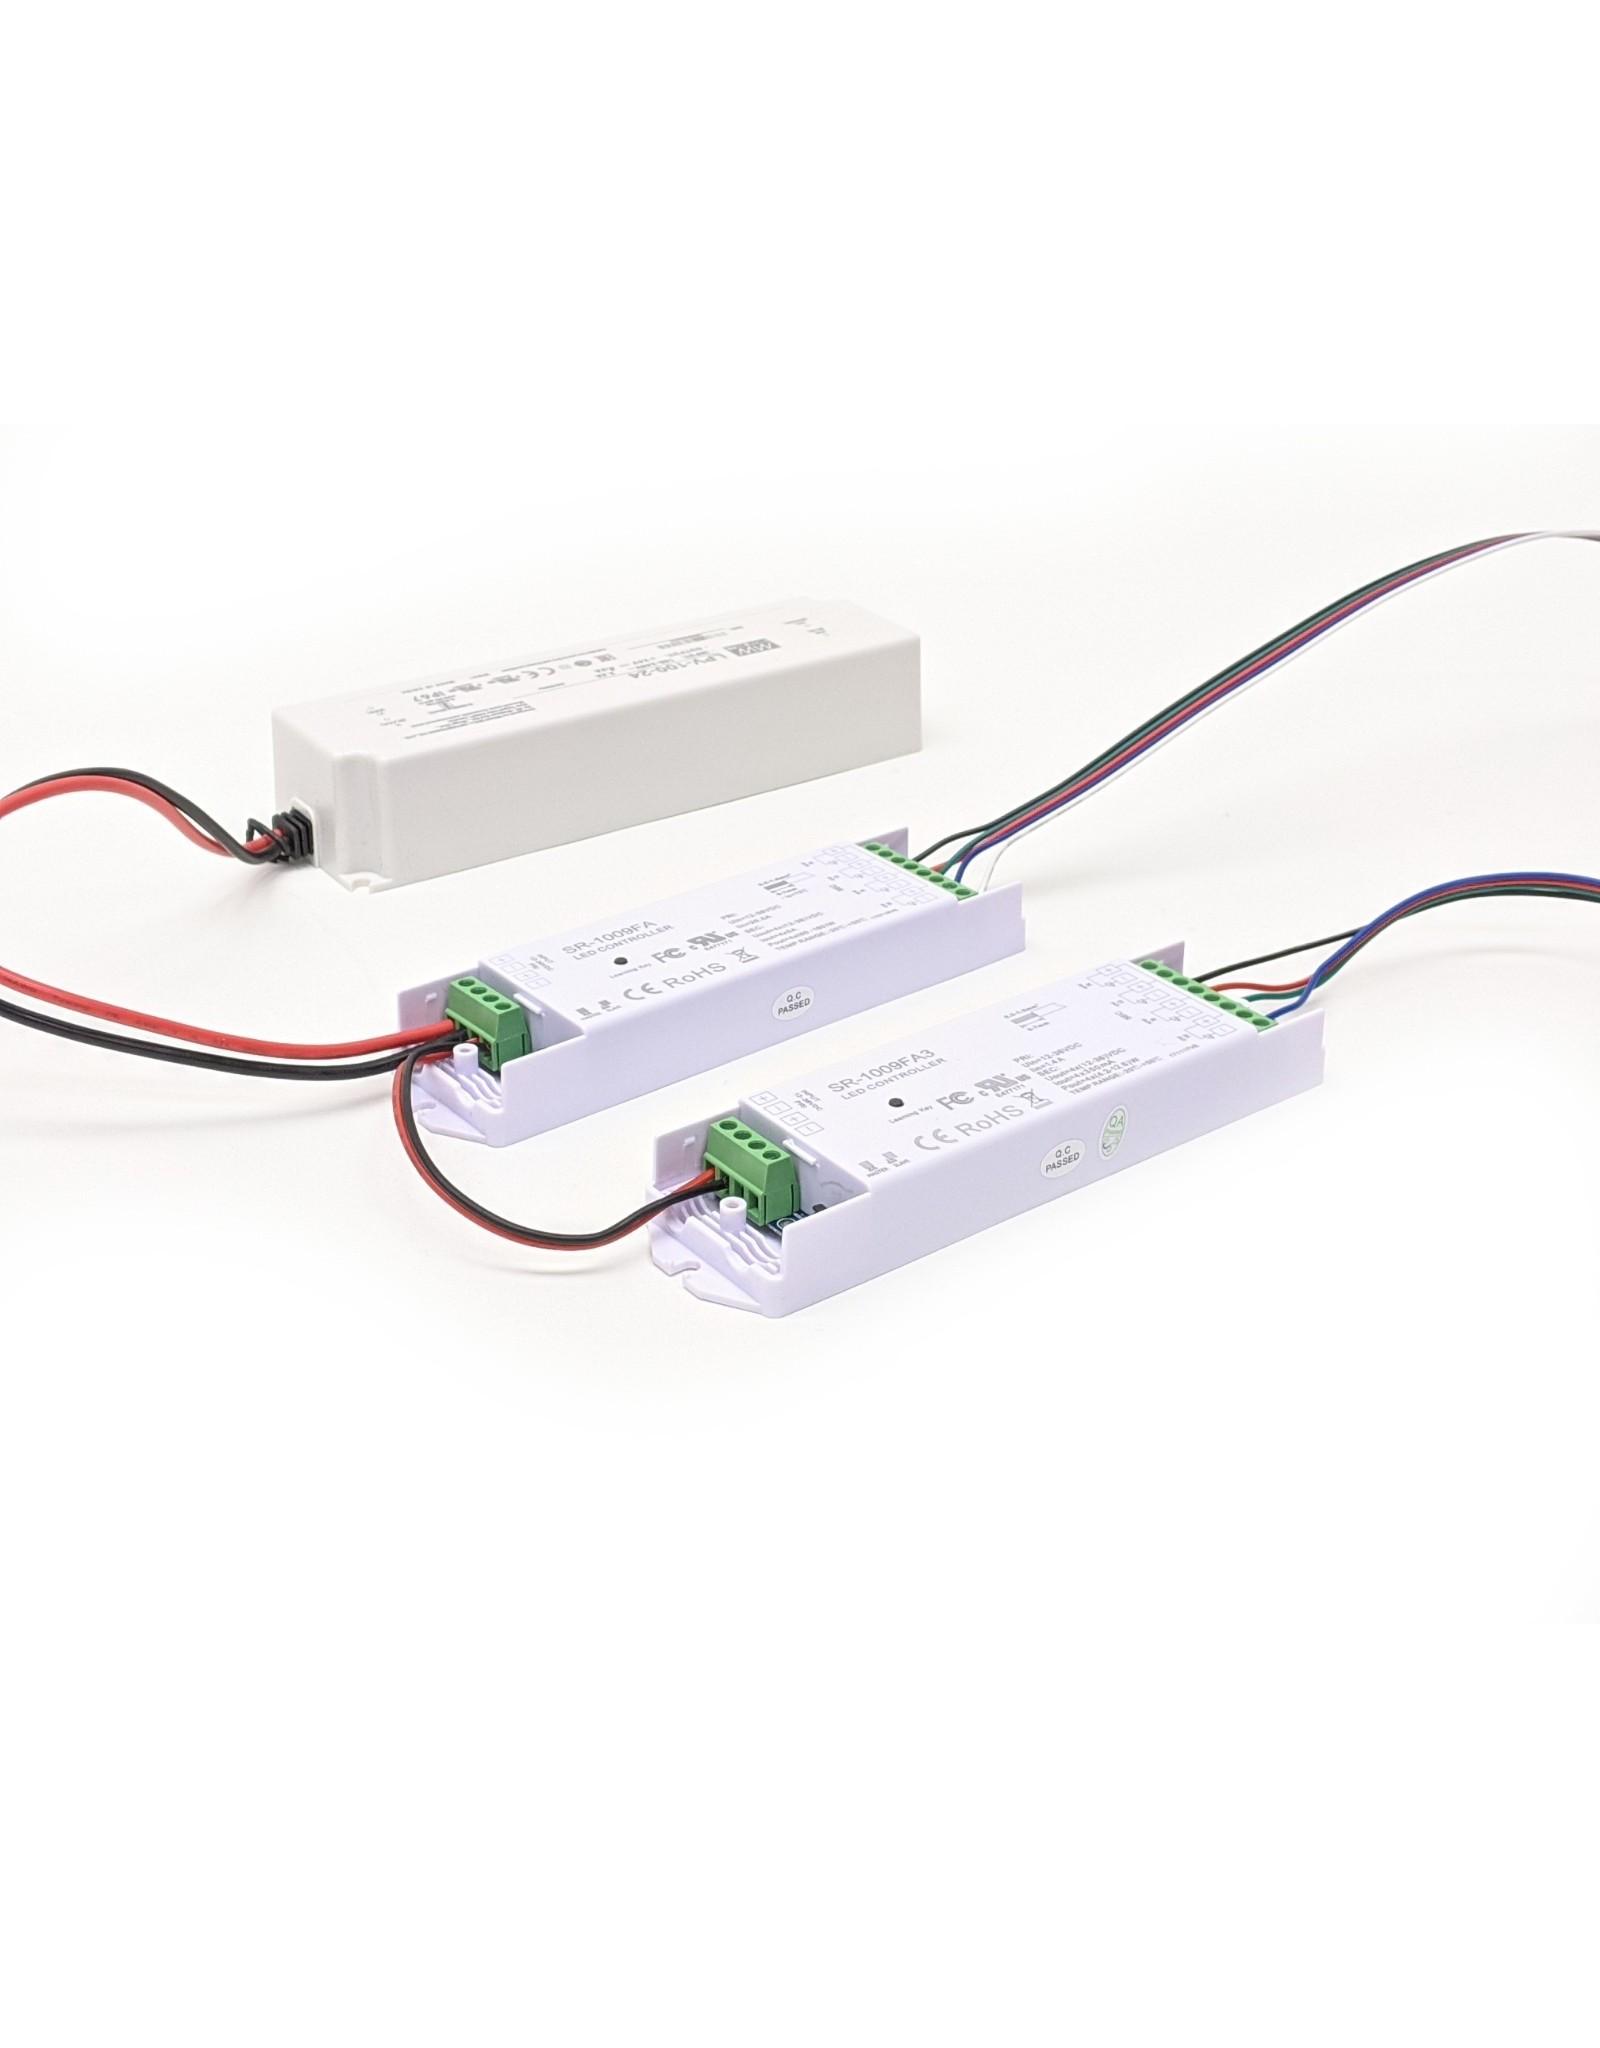 LedLed RGB(W) controller